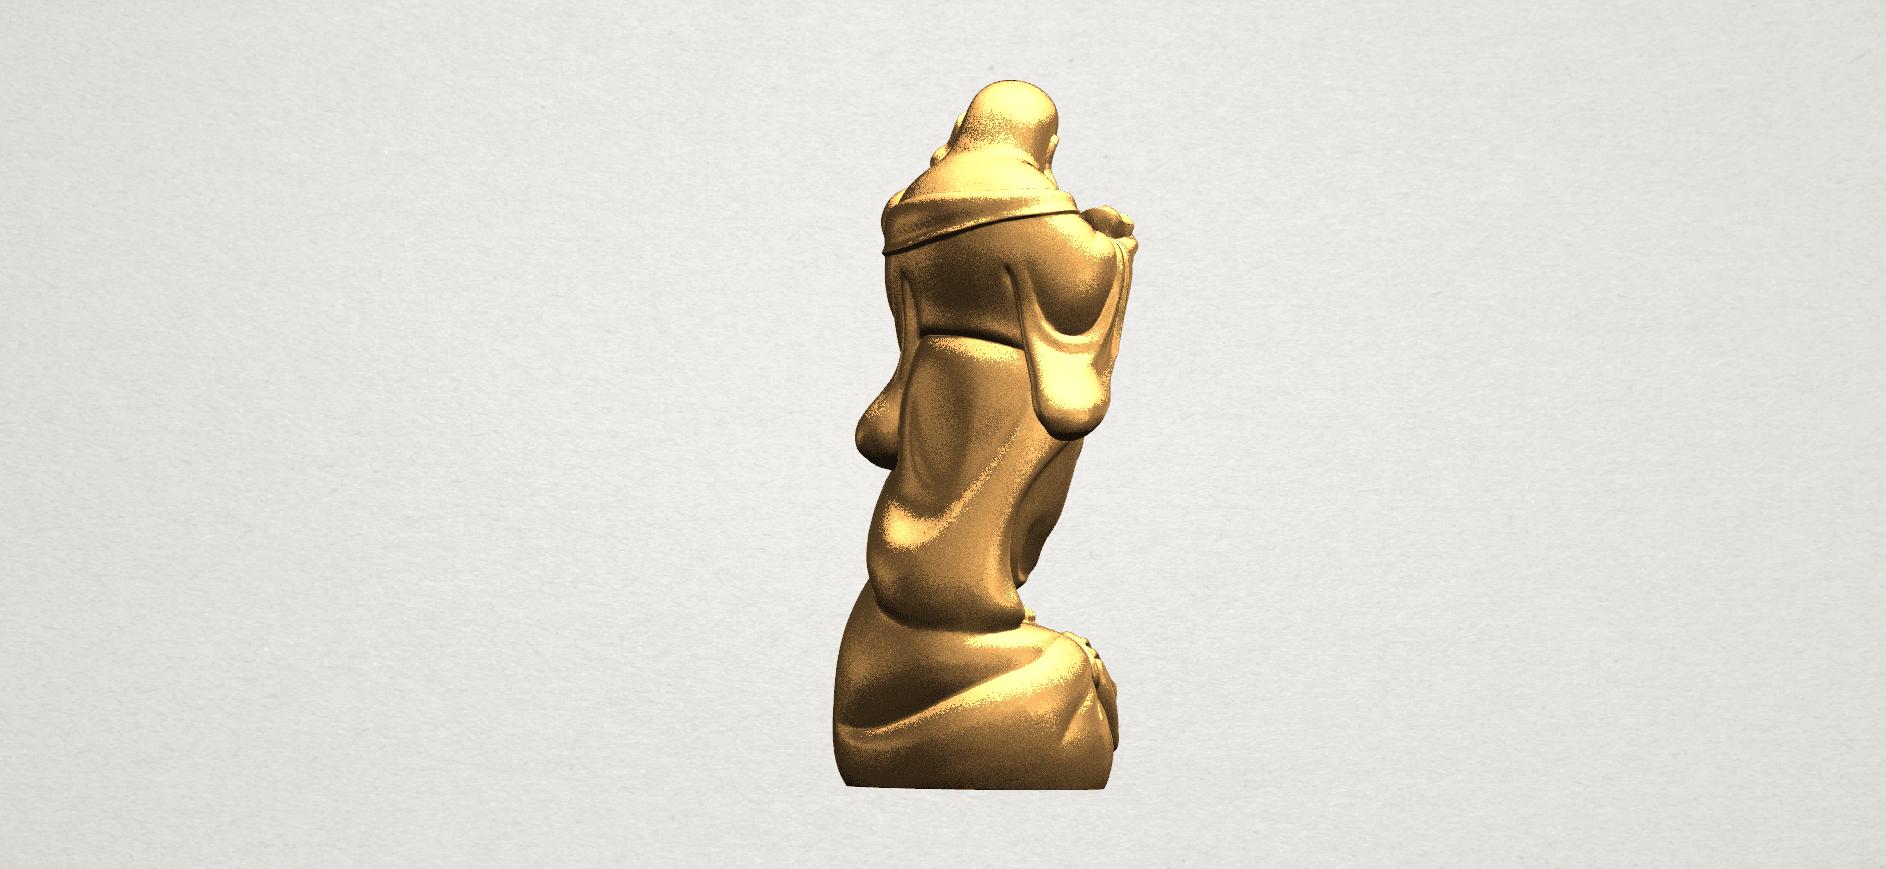 TDA0070 Metteyya Buddha 04 - 88mm - A06.png Download free STL file Metteyya Buddha 04 • 3D printable object, GeorgesNikkei